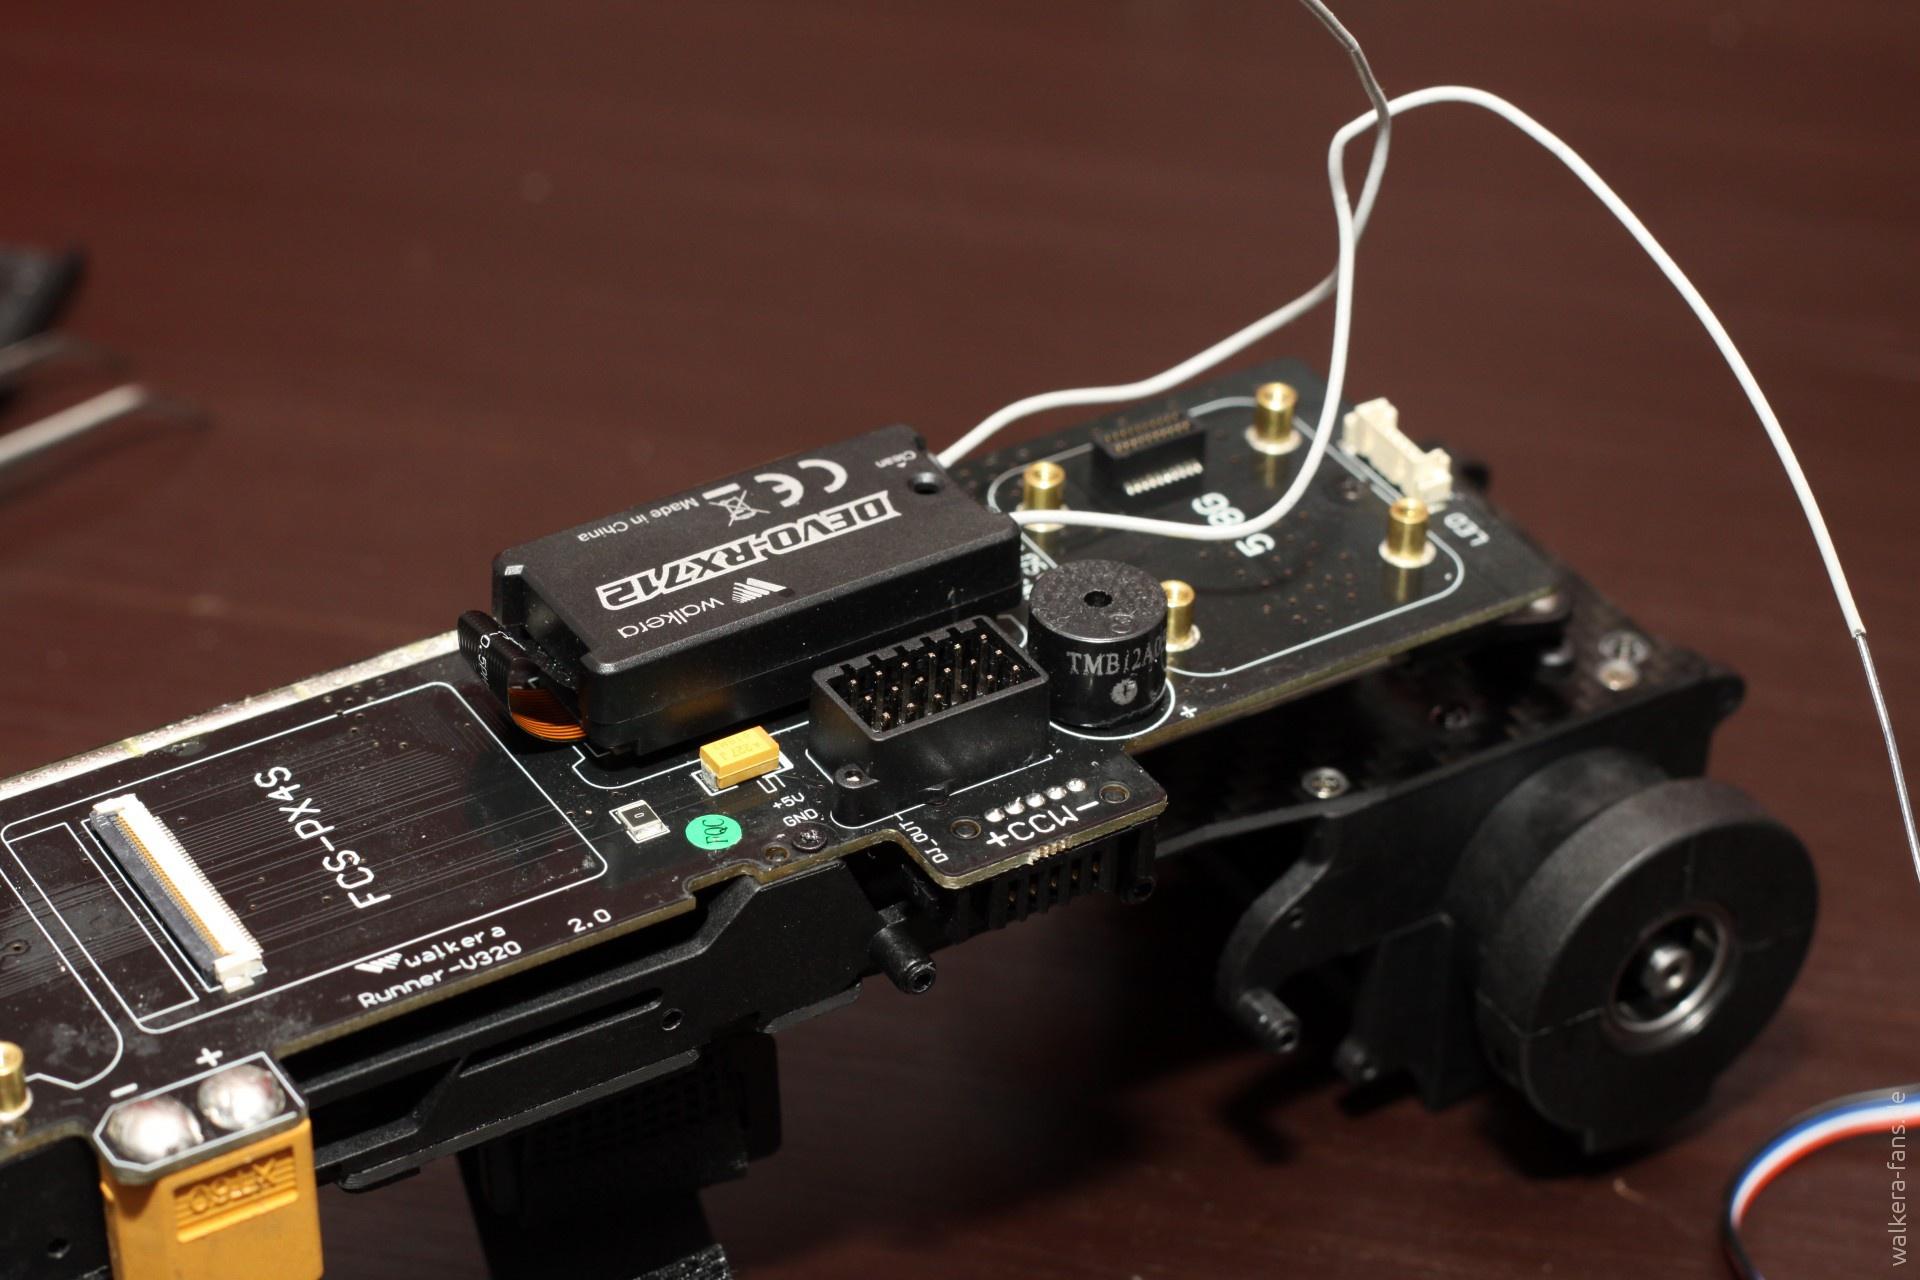 Furious 320 Von Innen Teil 2 Walkera Fans Drone Voyager 3 Gps Devo F12e G 3d Gimbal Ilook With Camera Putih